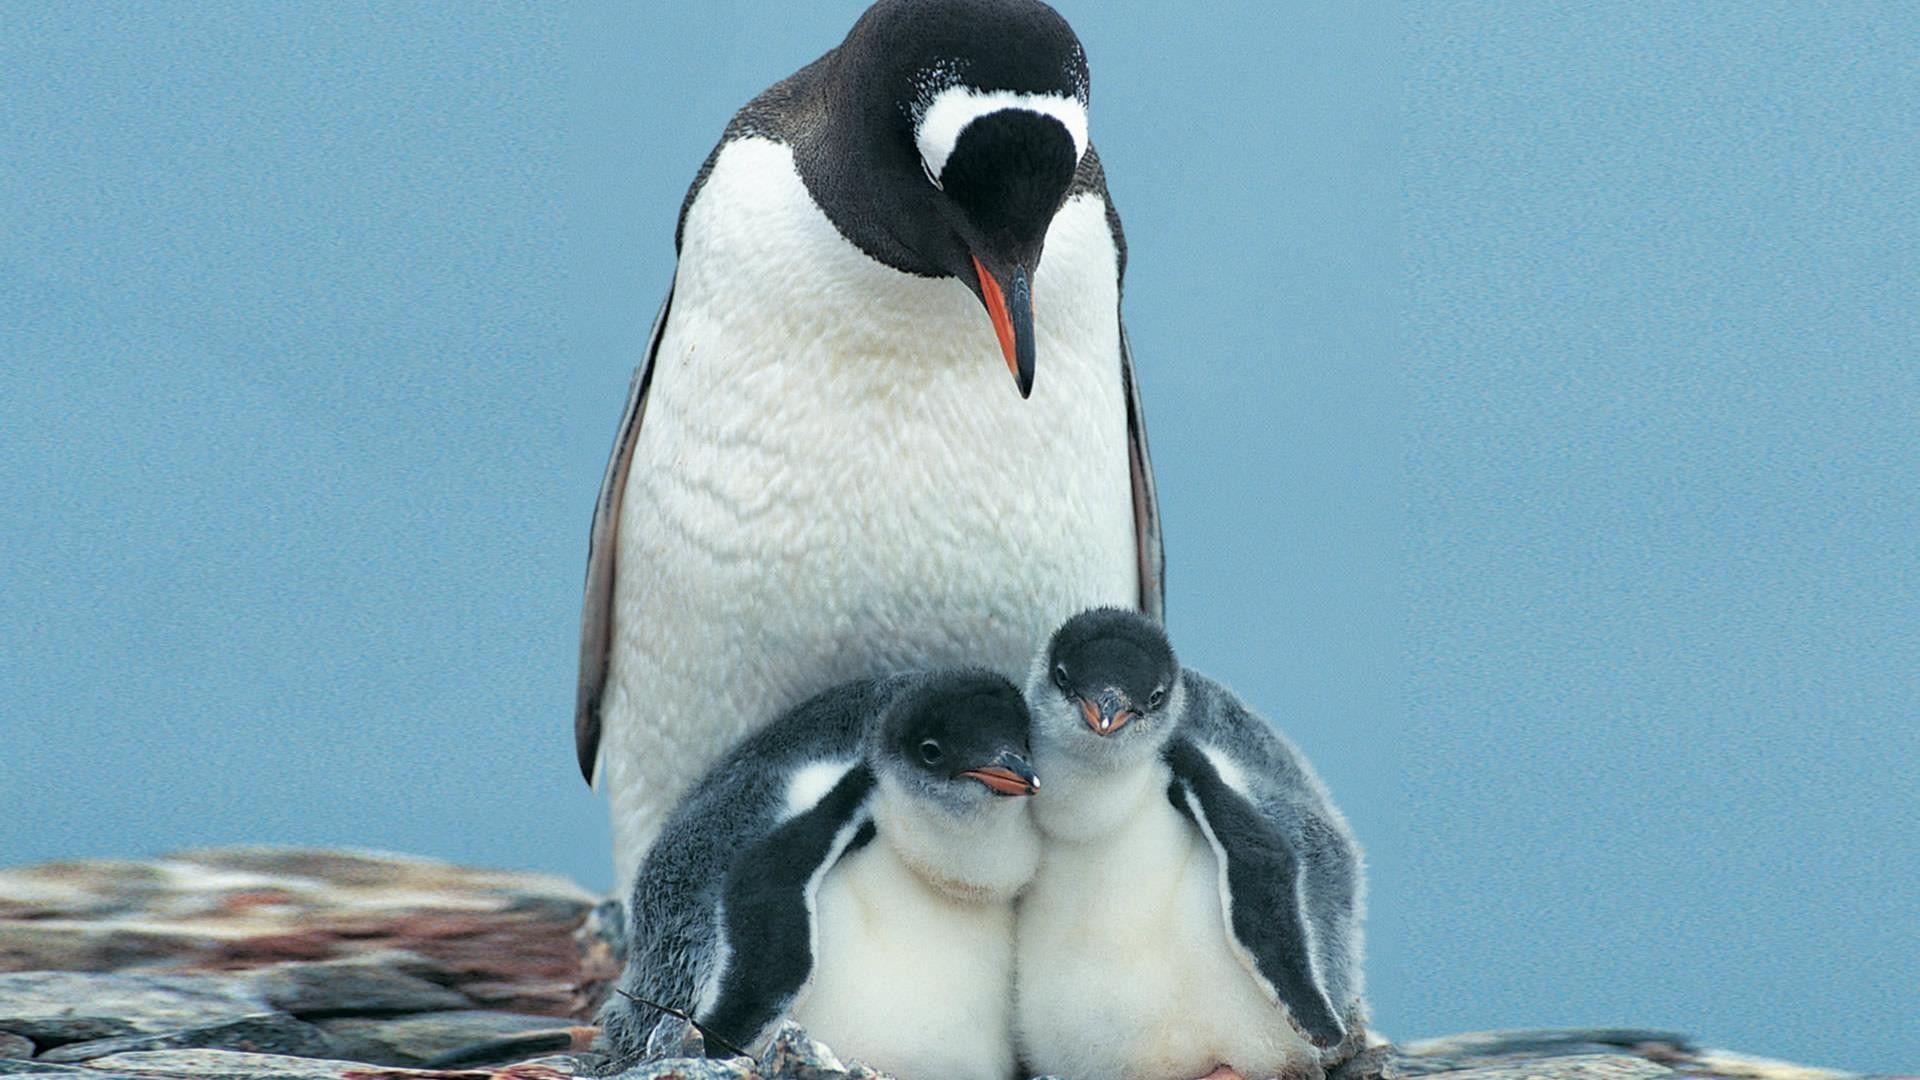 penguin wallpaper wallpapers - photo #17